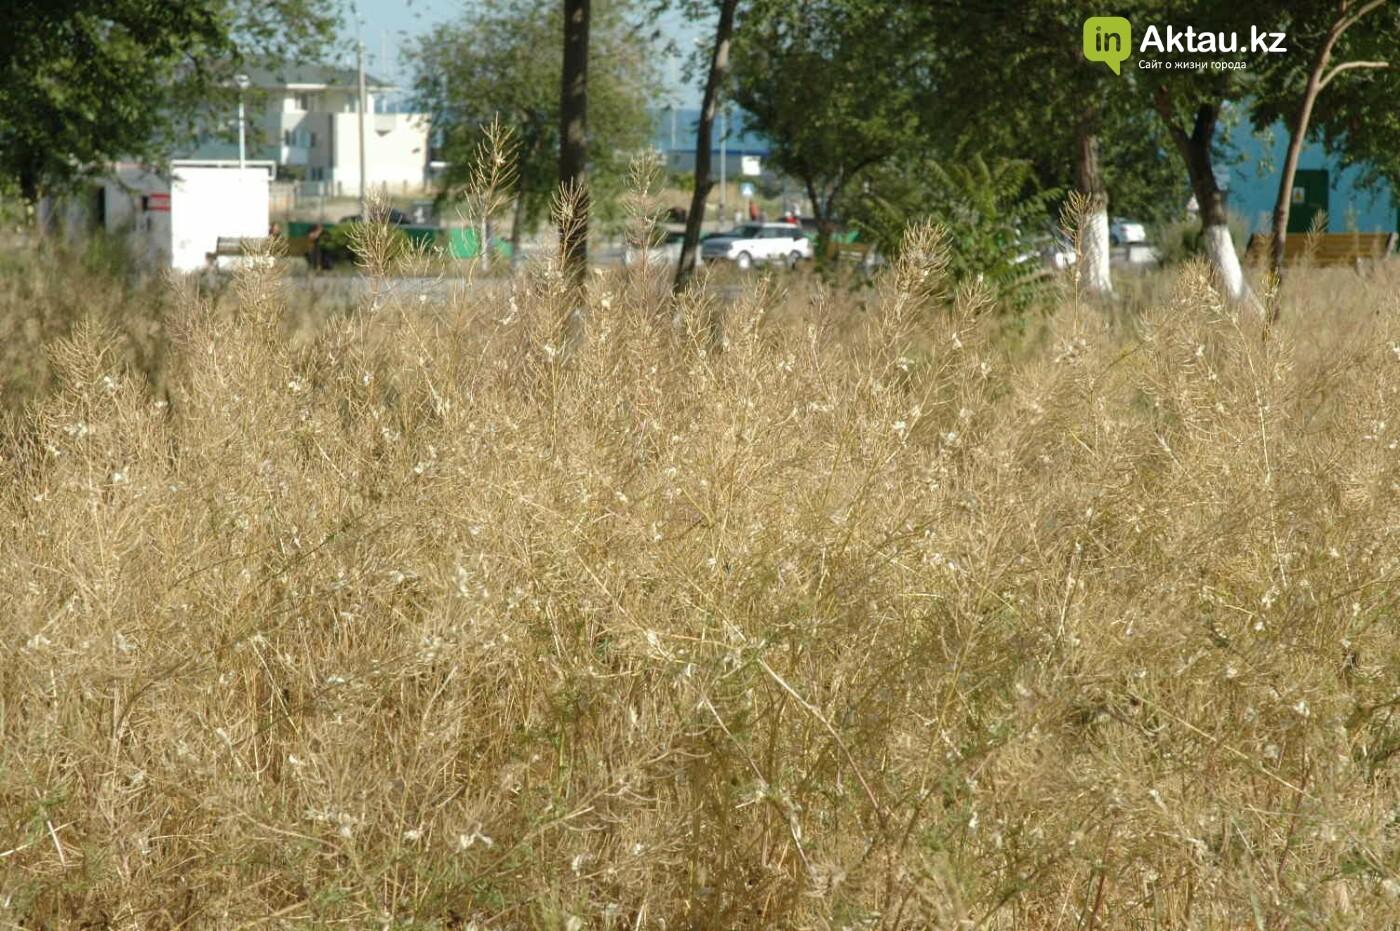 Погибшие от засухи и обезвоживания в Актау исчисляются десятками (ФОТО), фото-39